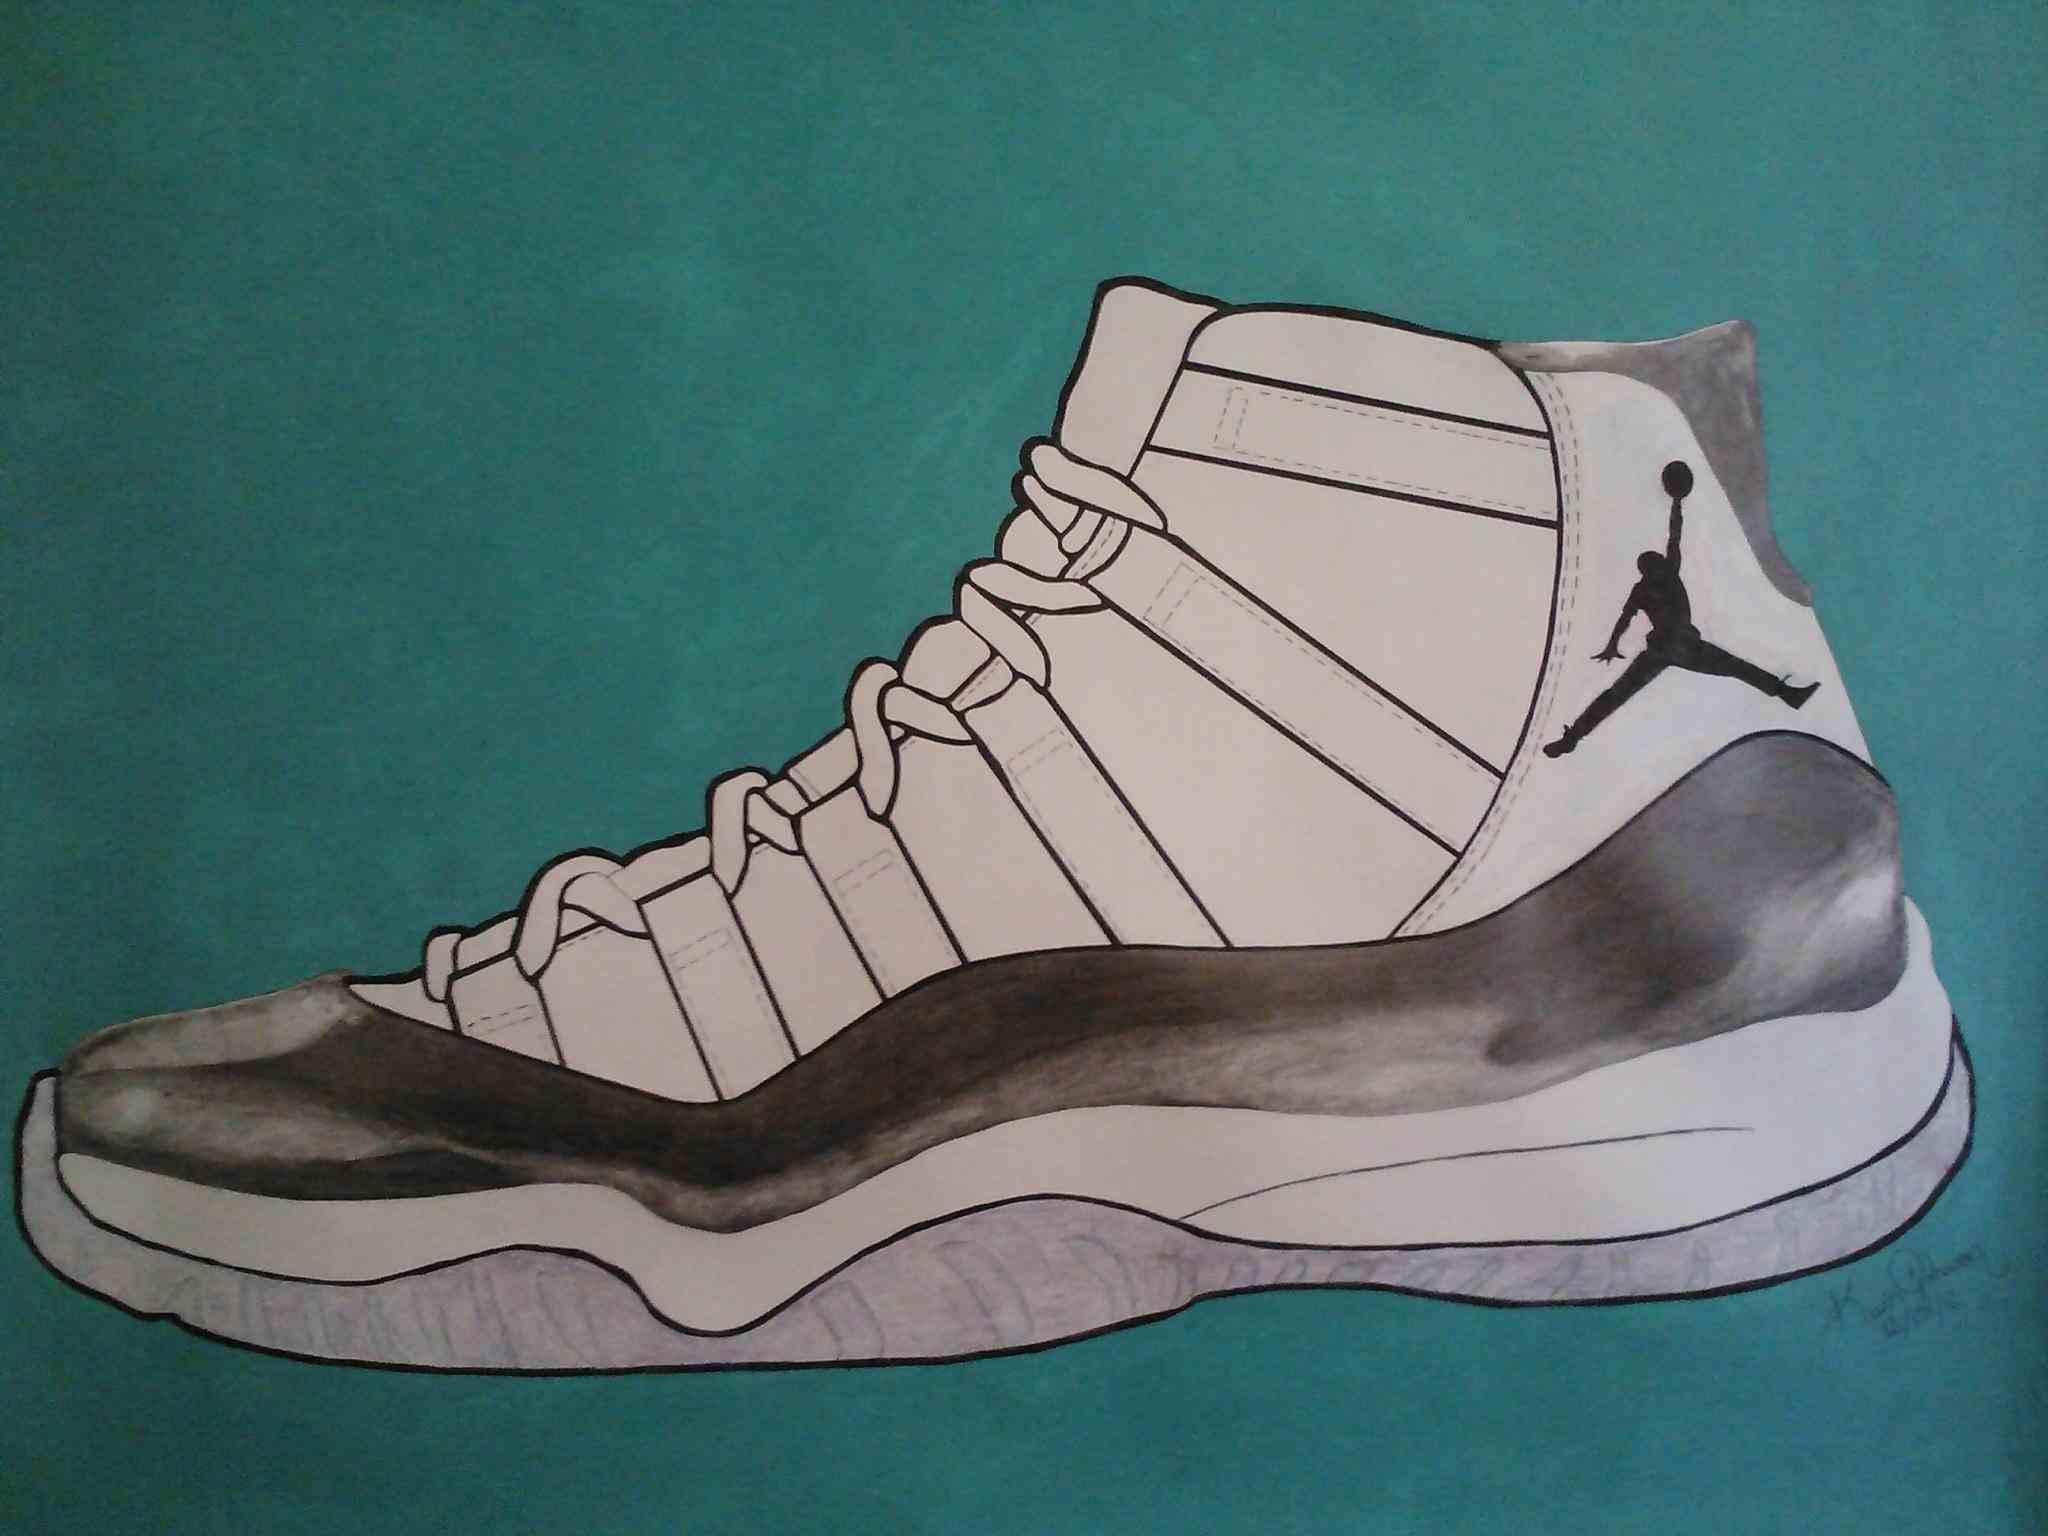 2048x1536 Air Jordan 3 Outsole Blueprints For Dummies Sneakerfactory